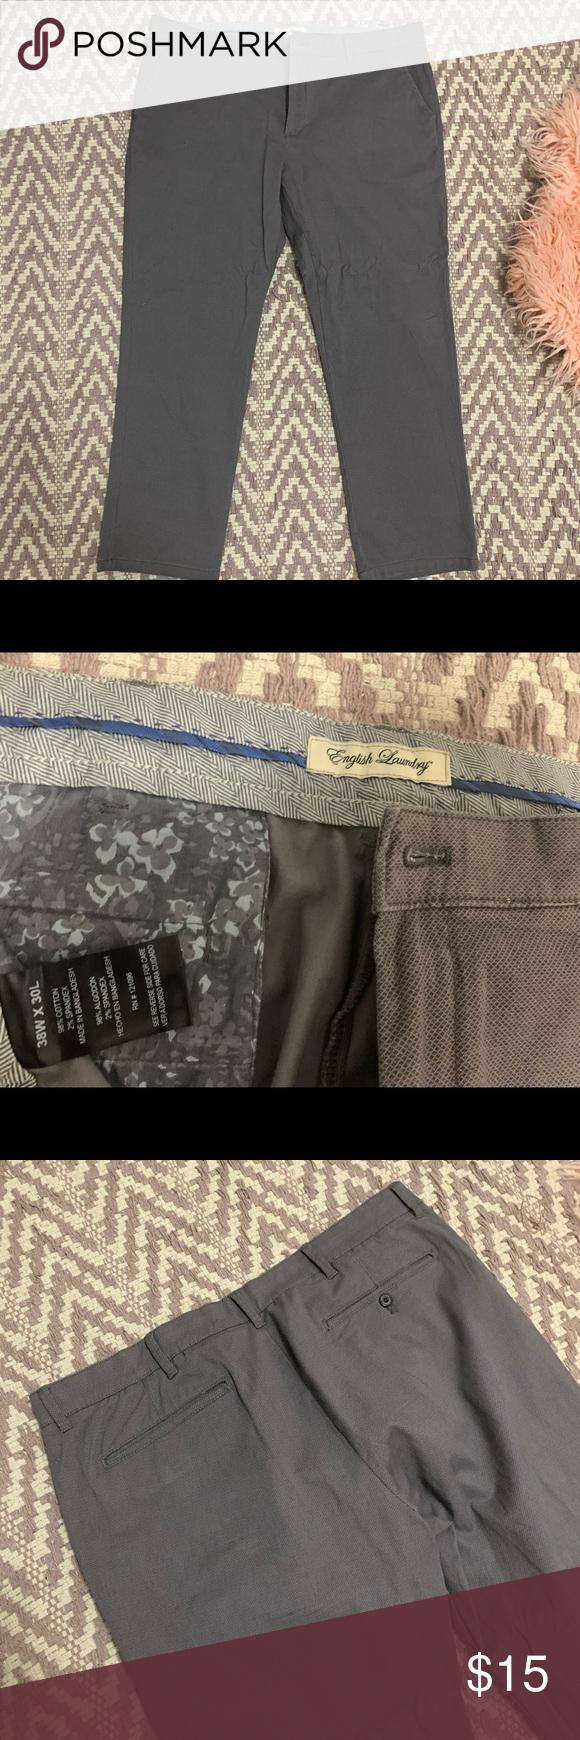 Gray English Laundry Men Pants Mens Pants English Laundry